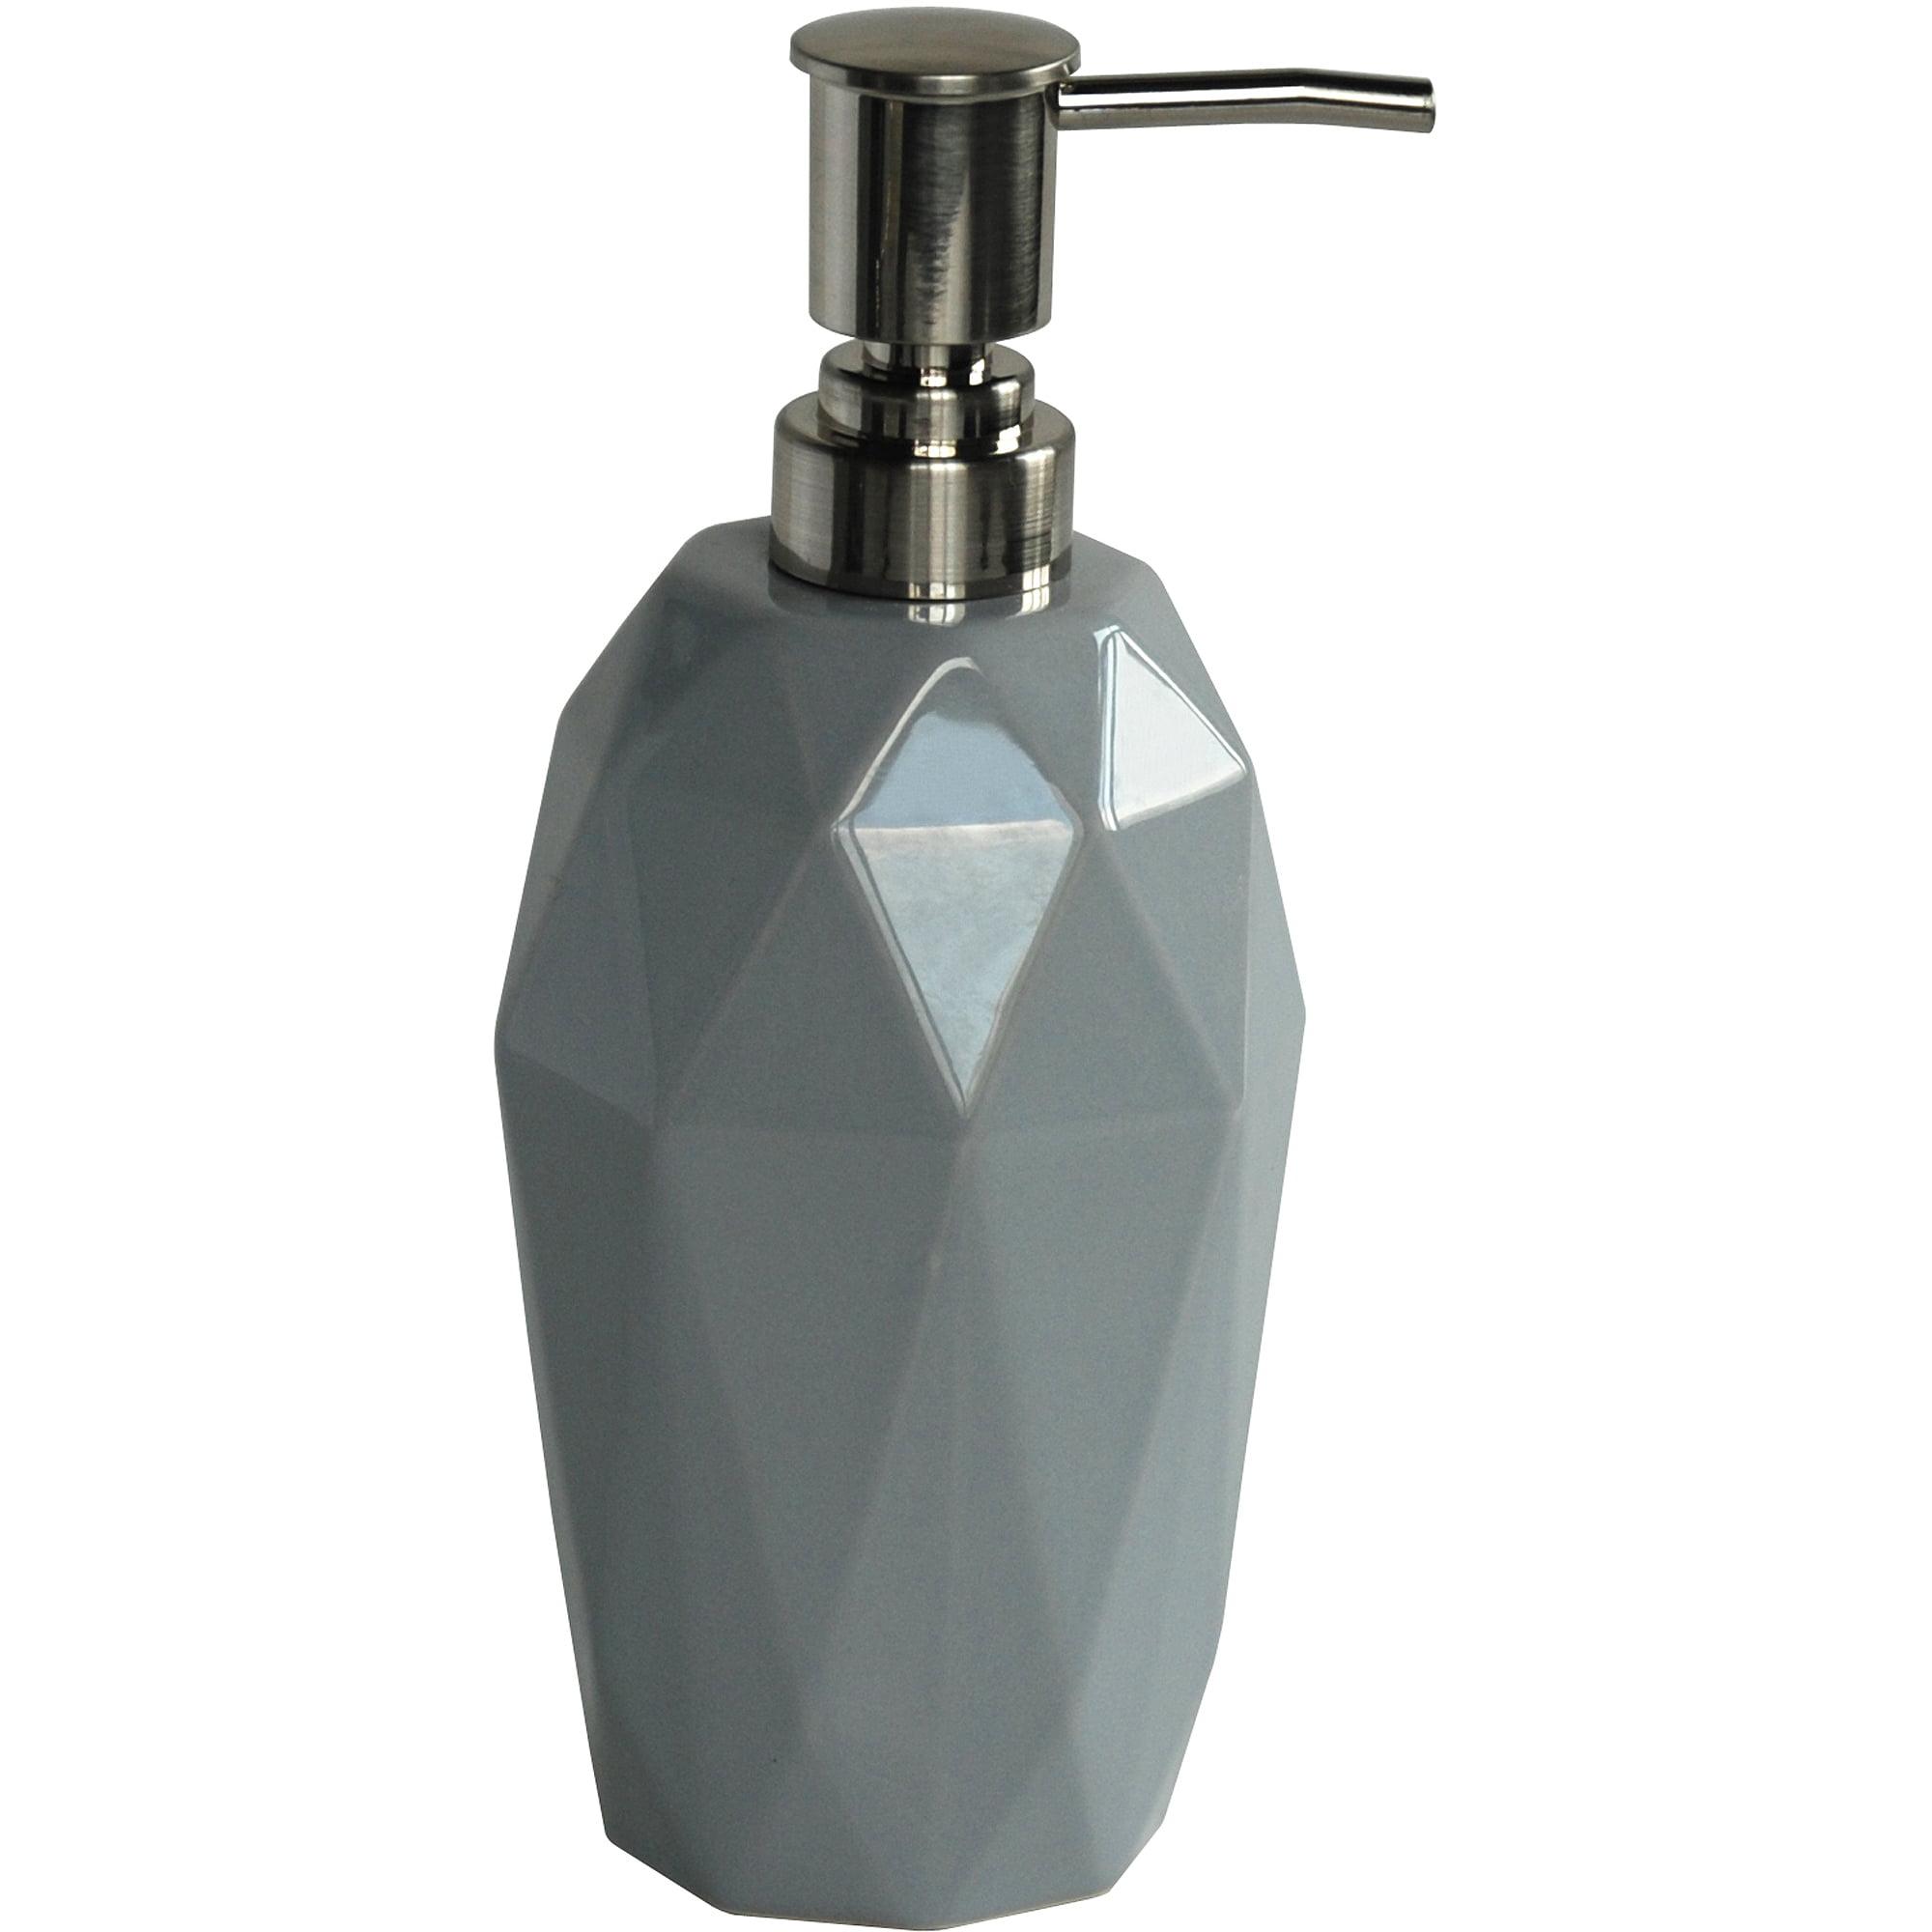 Automatic Hand Soap Dispenser Walmart